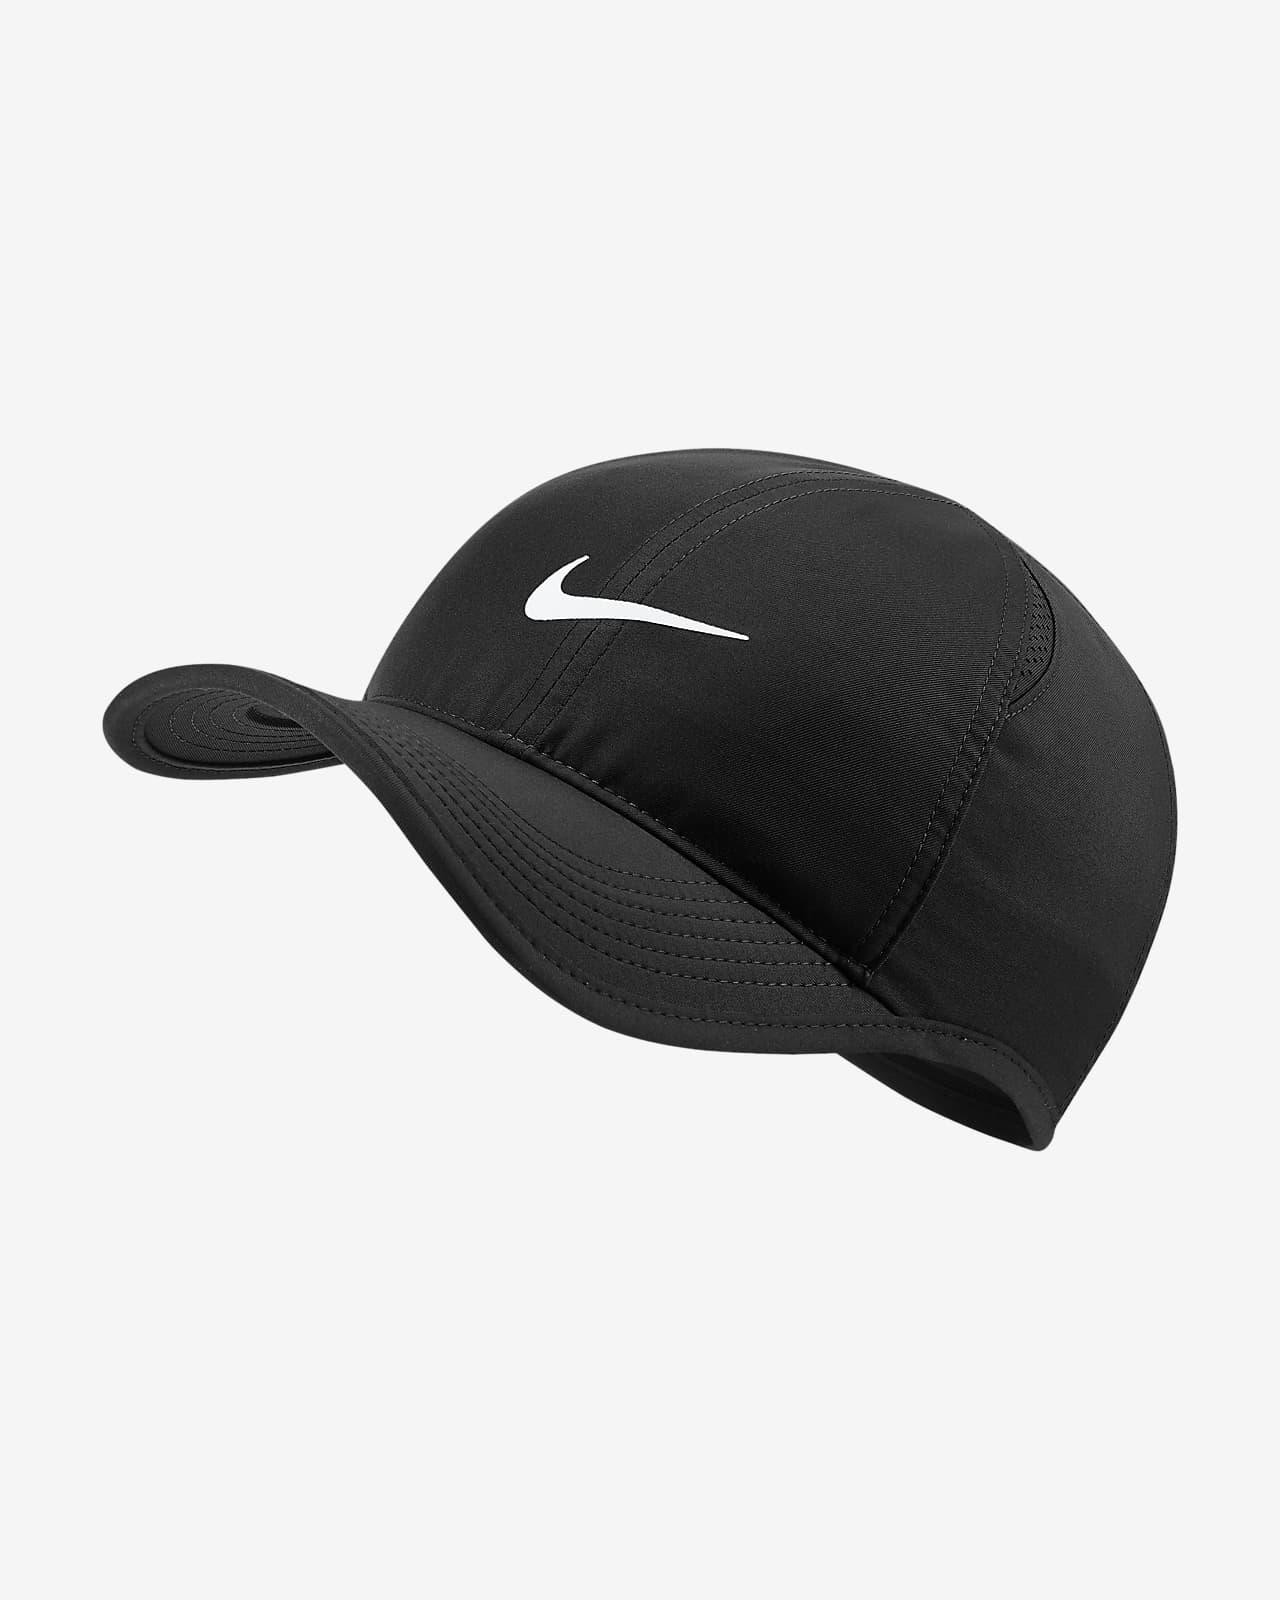 Nike Sportswear AeroBill Featherlight Adjustable Cap